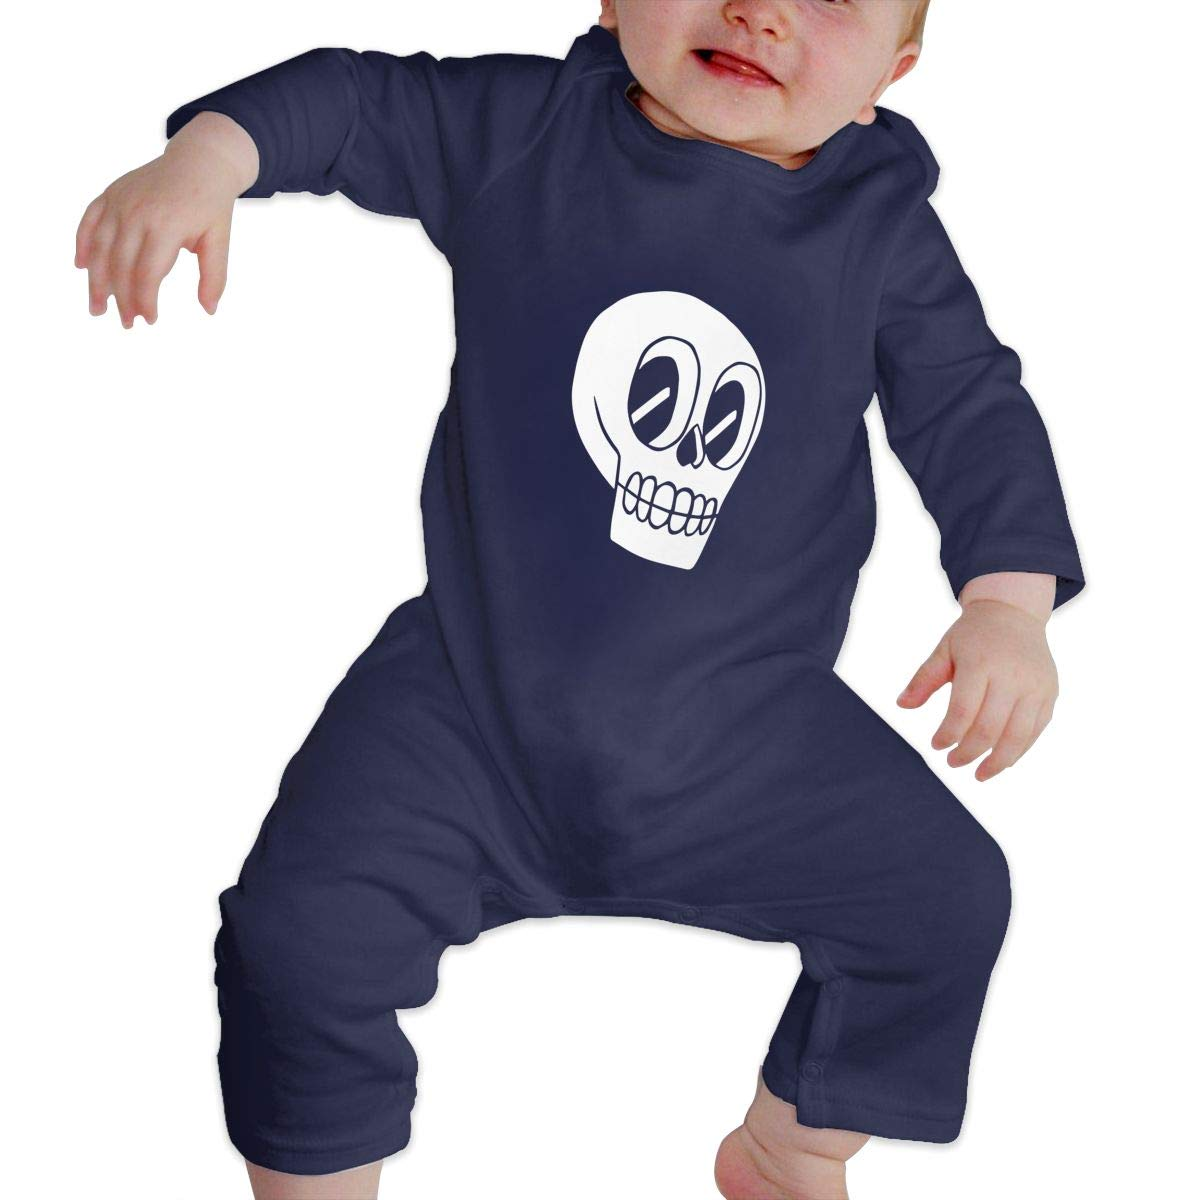 Db84UR@5p Infant Baby Girls Boys Long Sleeve Bodysuit Comfortable Skelly Skull Cotton